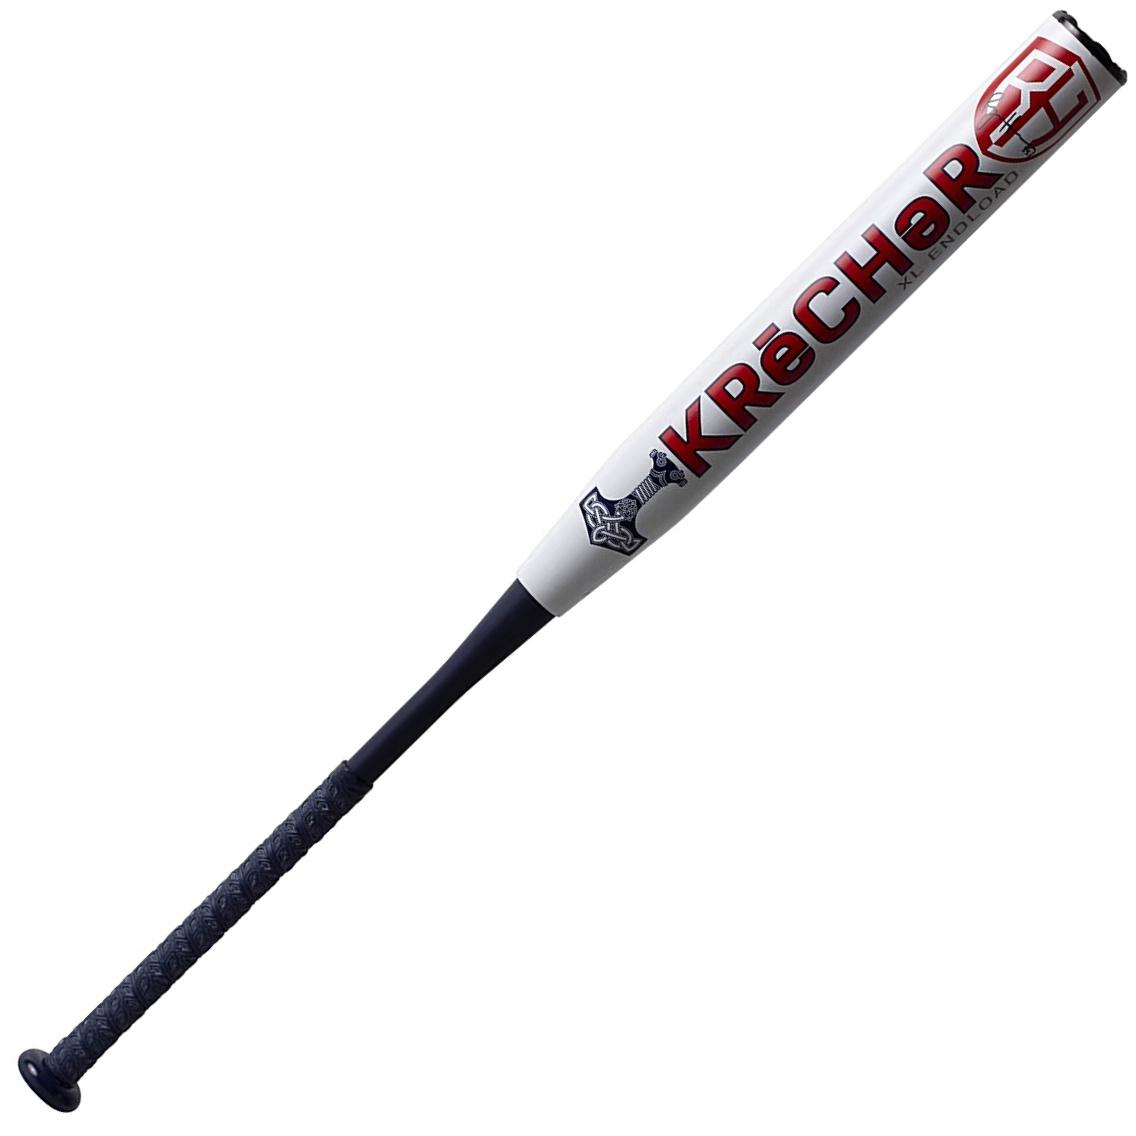 worth-ryan-harvey-krecher-xl-13-5-usa-asa-slowpitch-bat-34-inch-26-oz WRH21A-3-26